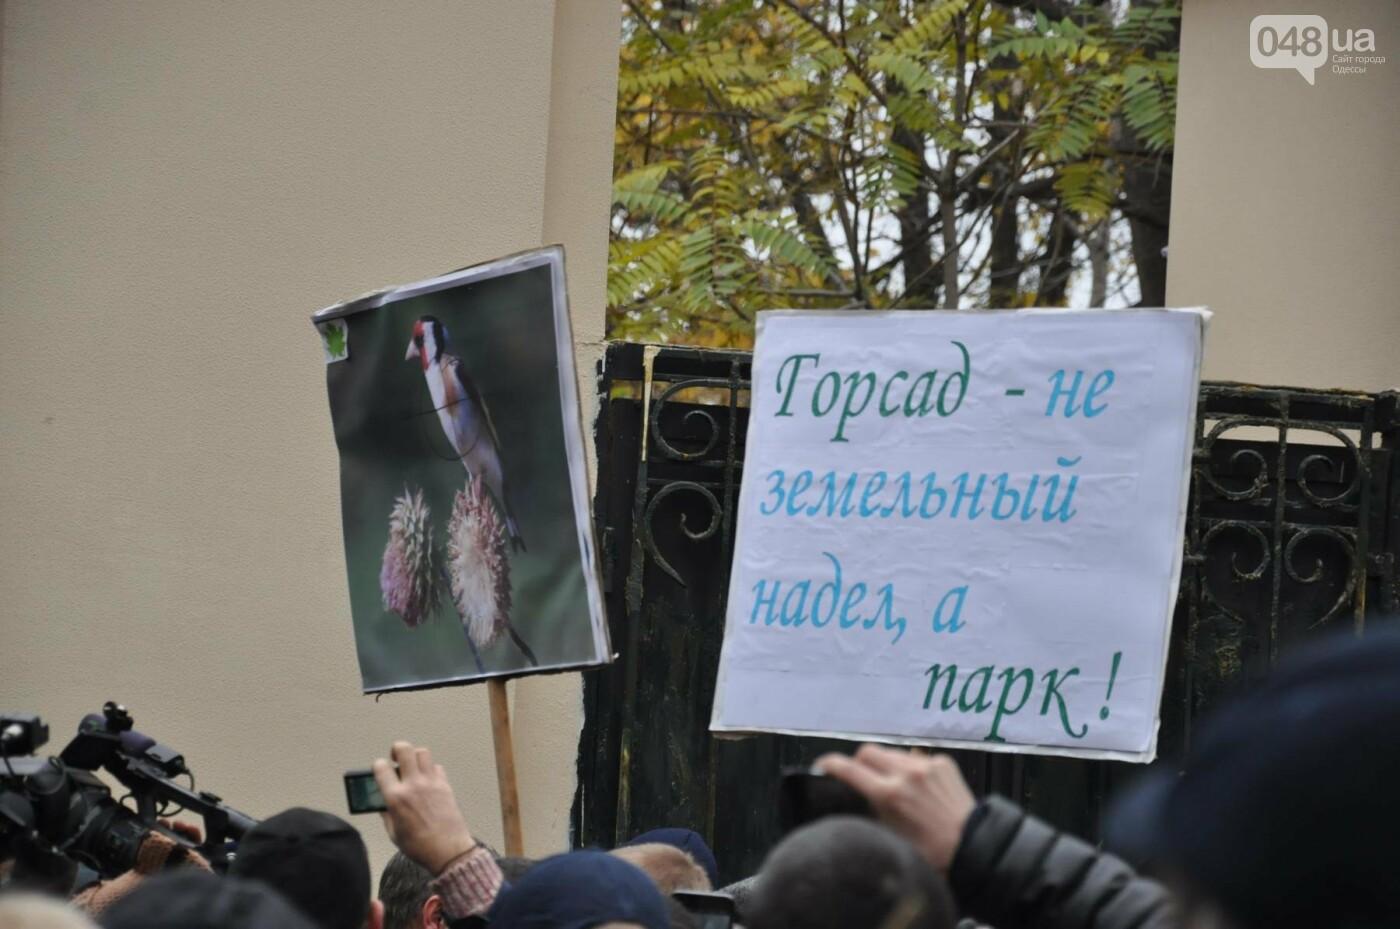 Около 5 сотен одесситов протестовали против застройки Горсада (ФОТО) , фото-13